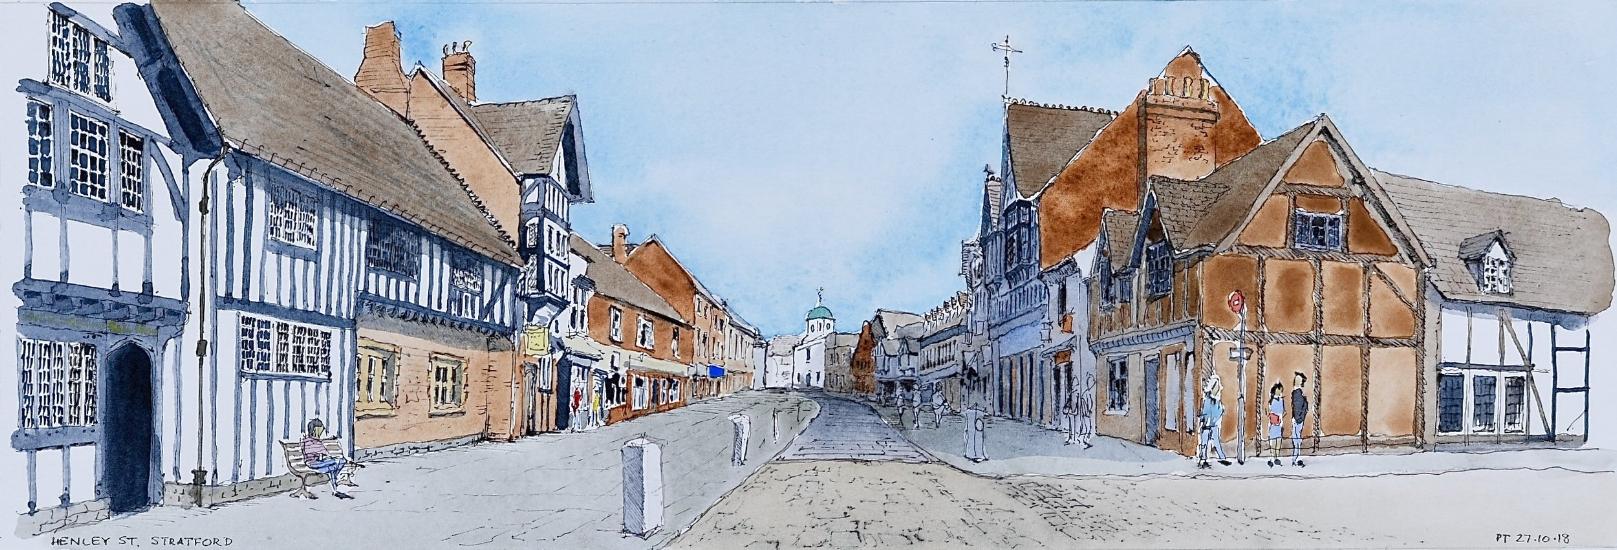 Henley Street